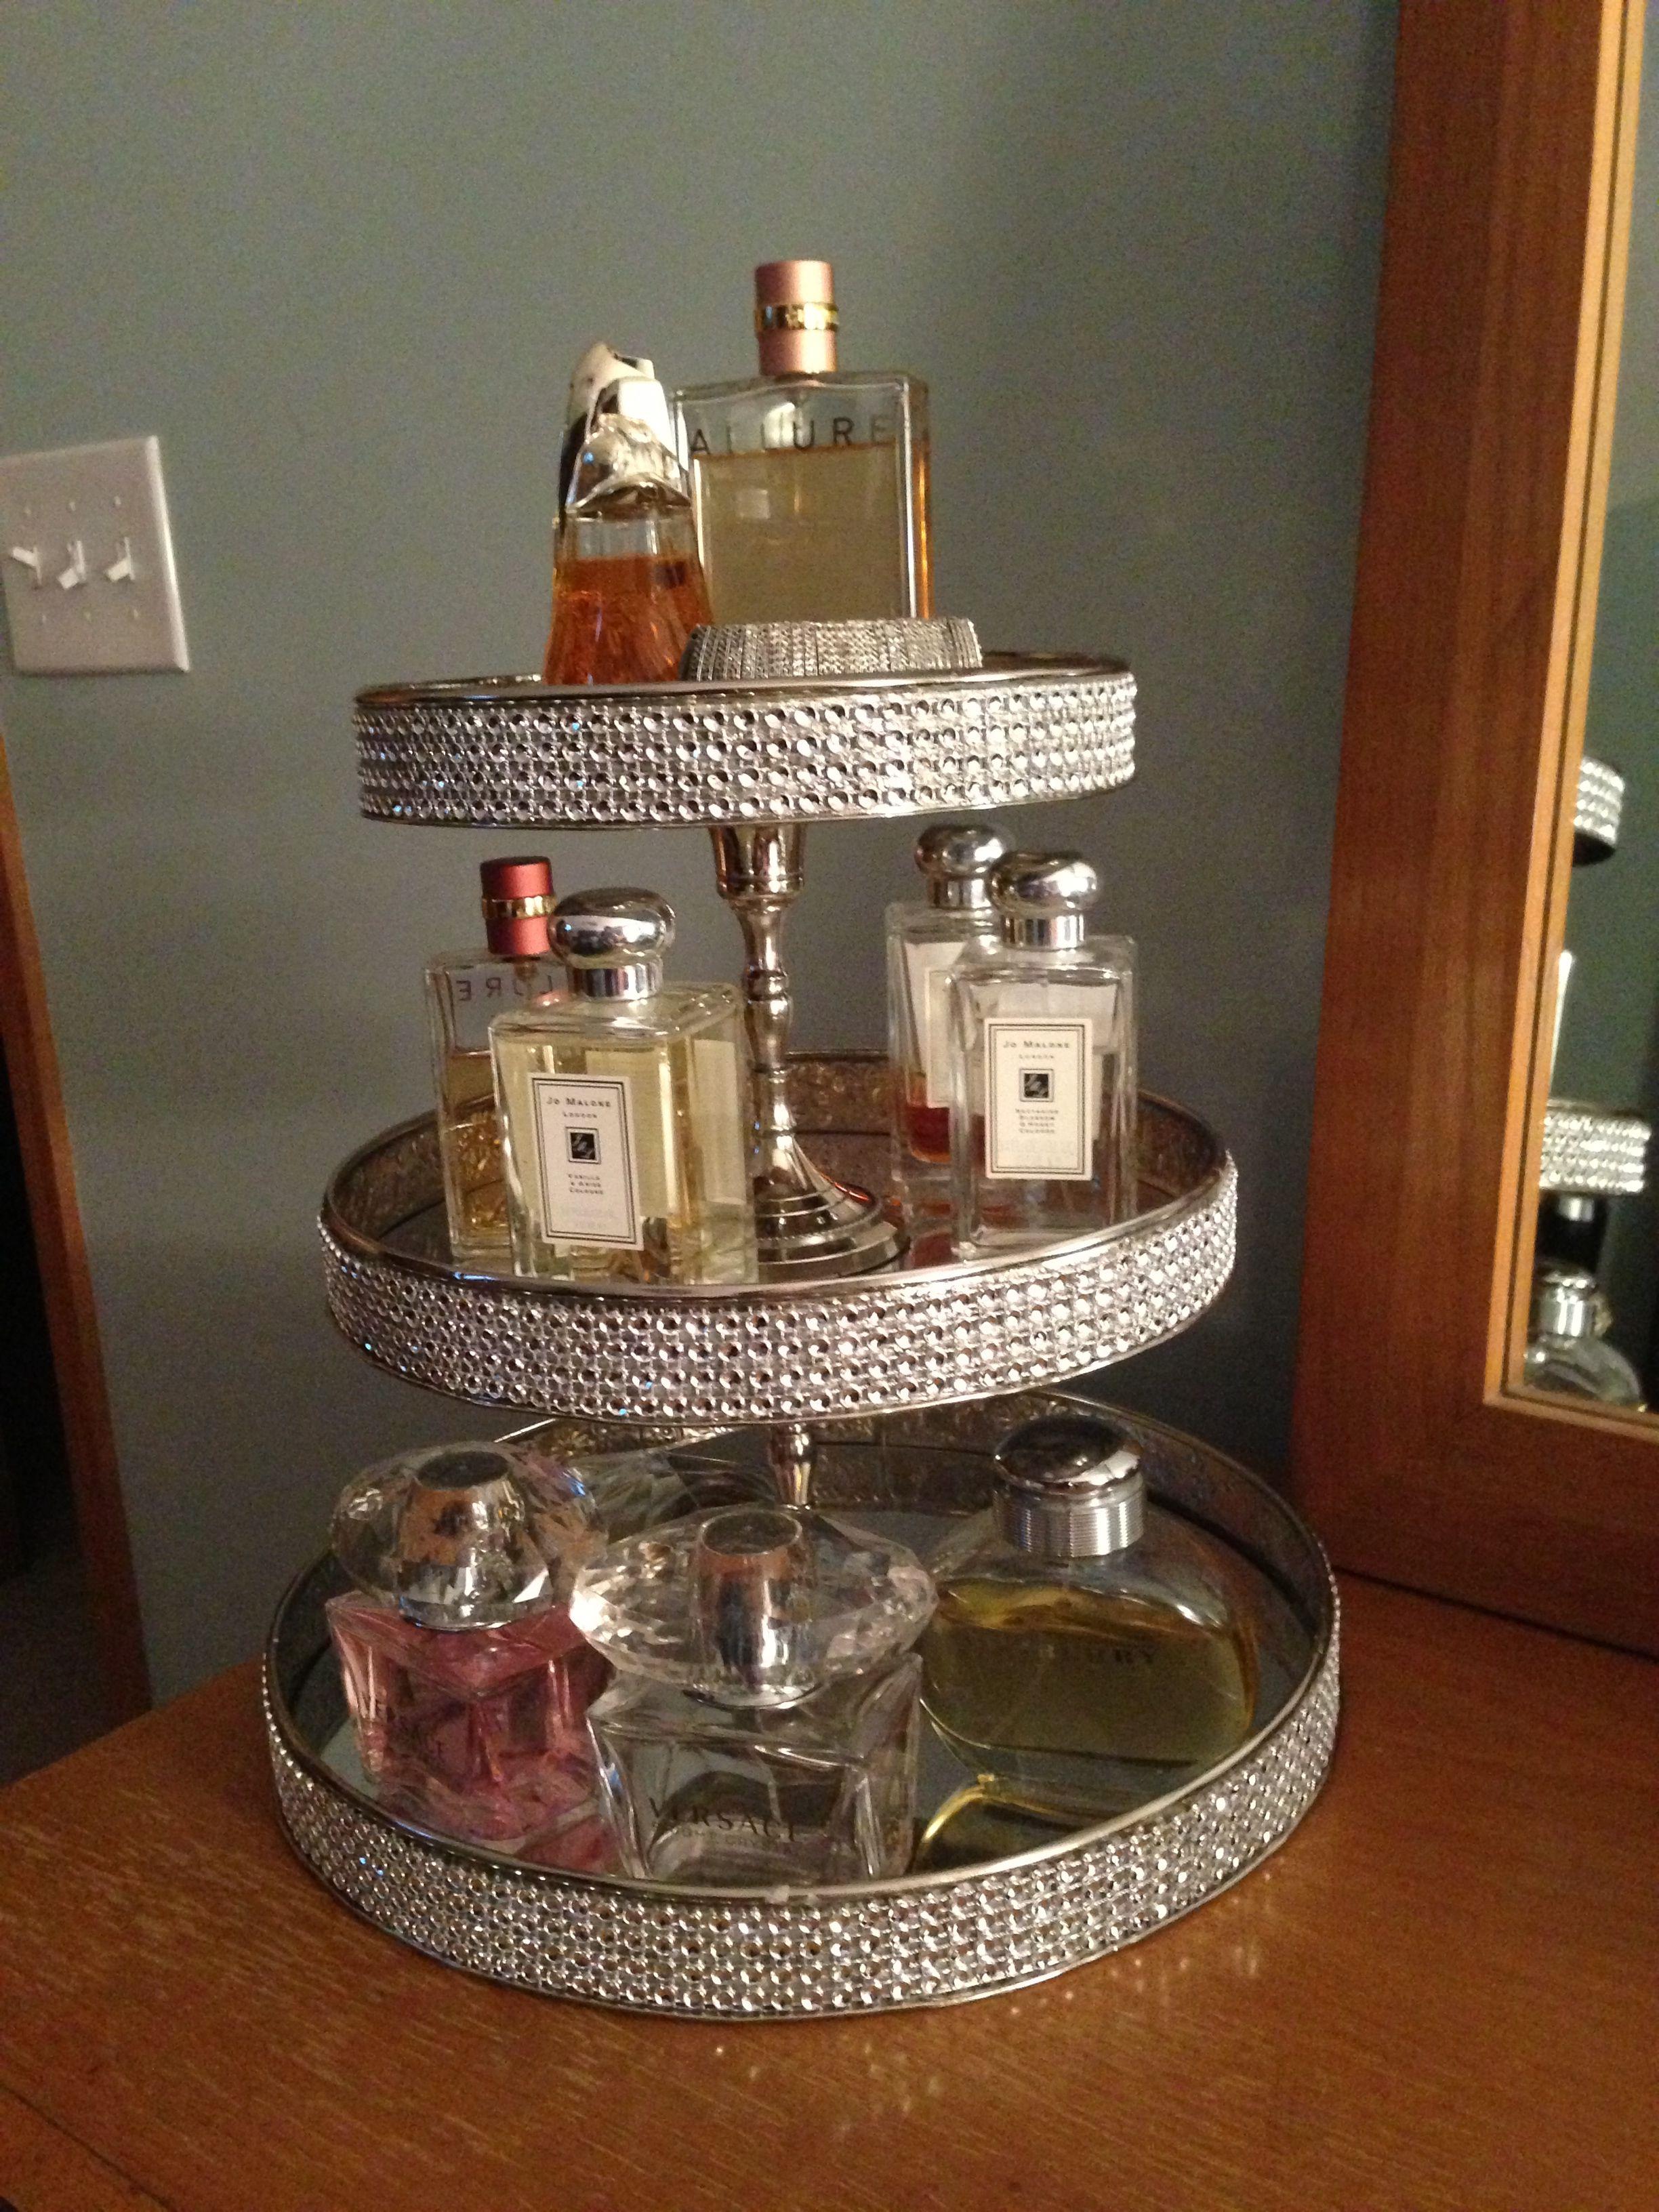 Diy Perfume Tray Love This For The Bedroom Perfume Tray Bathroom Organization Diy Perfume Display